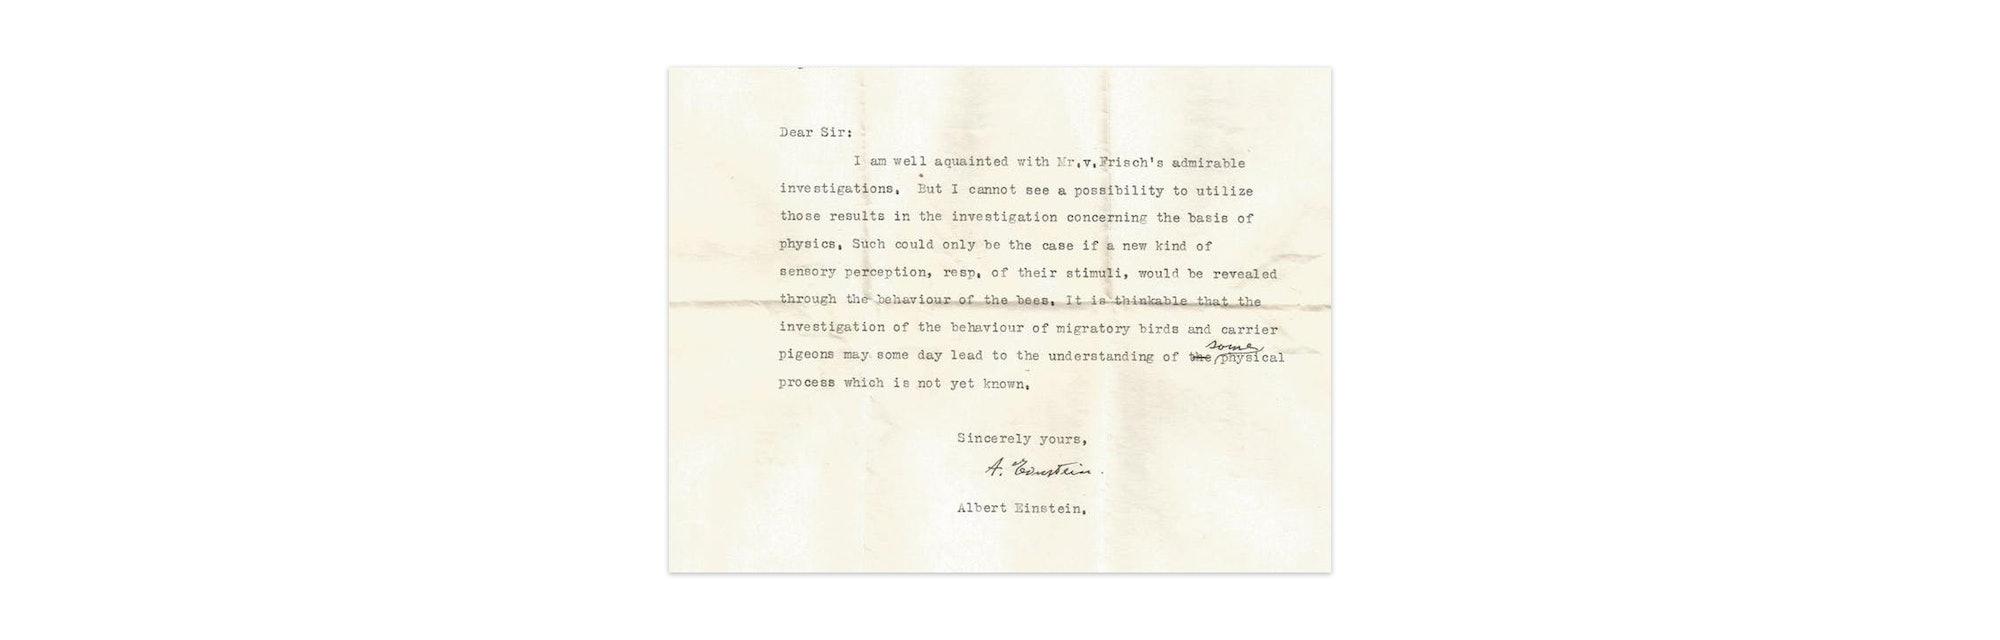 The Albert Einstein Archives at The Hebrew University of Jerusalem